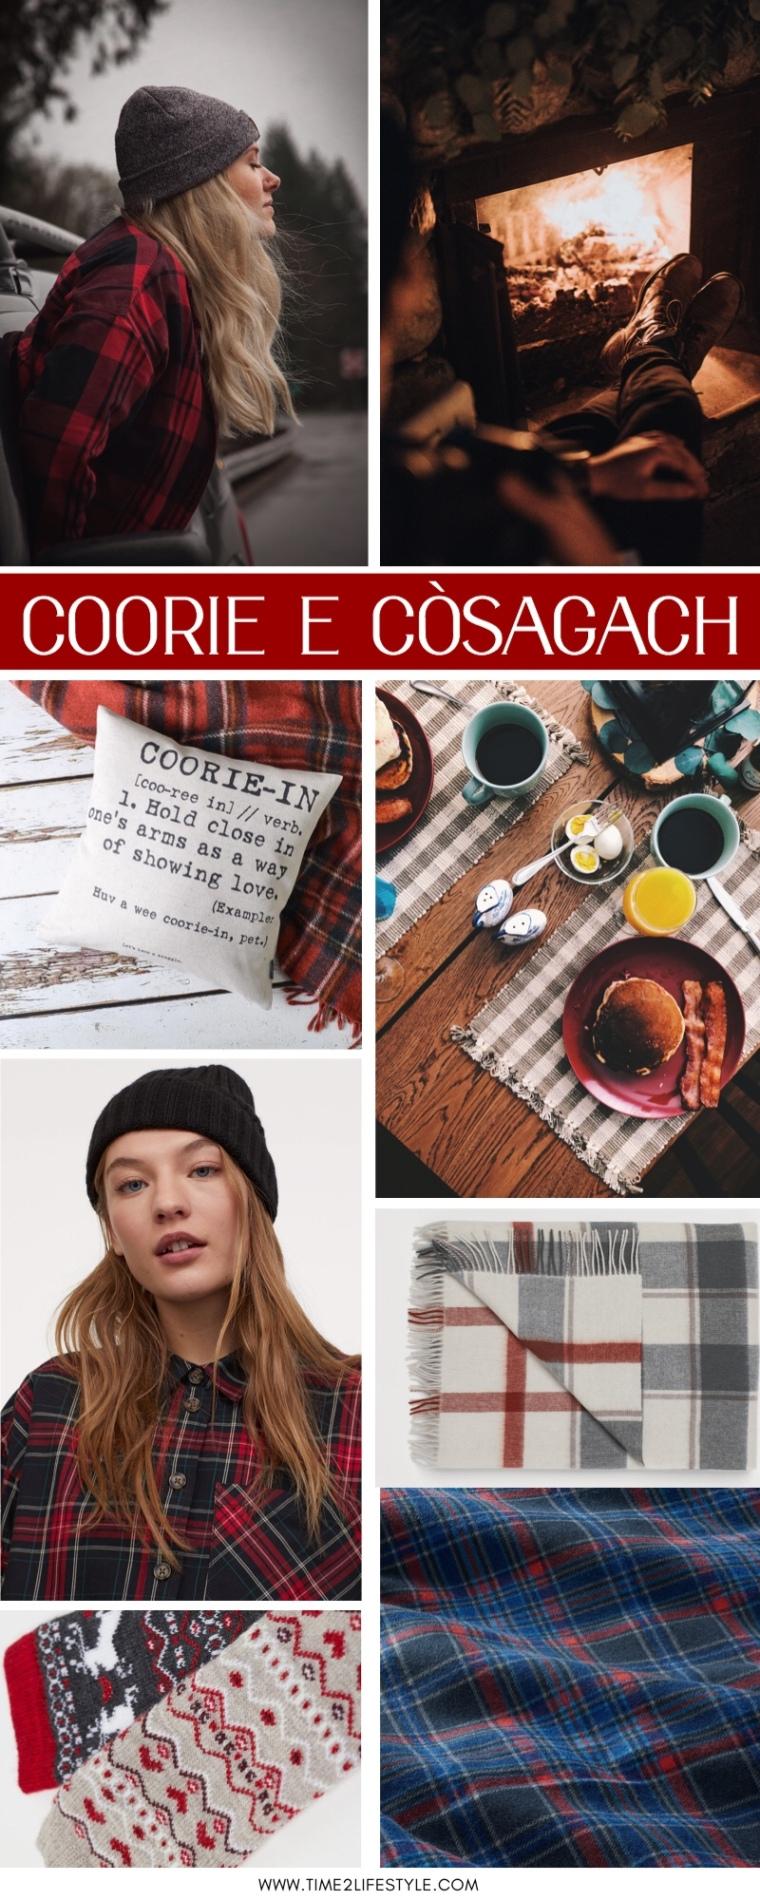 New lifestyle trend Coorie-Còsadach